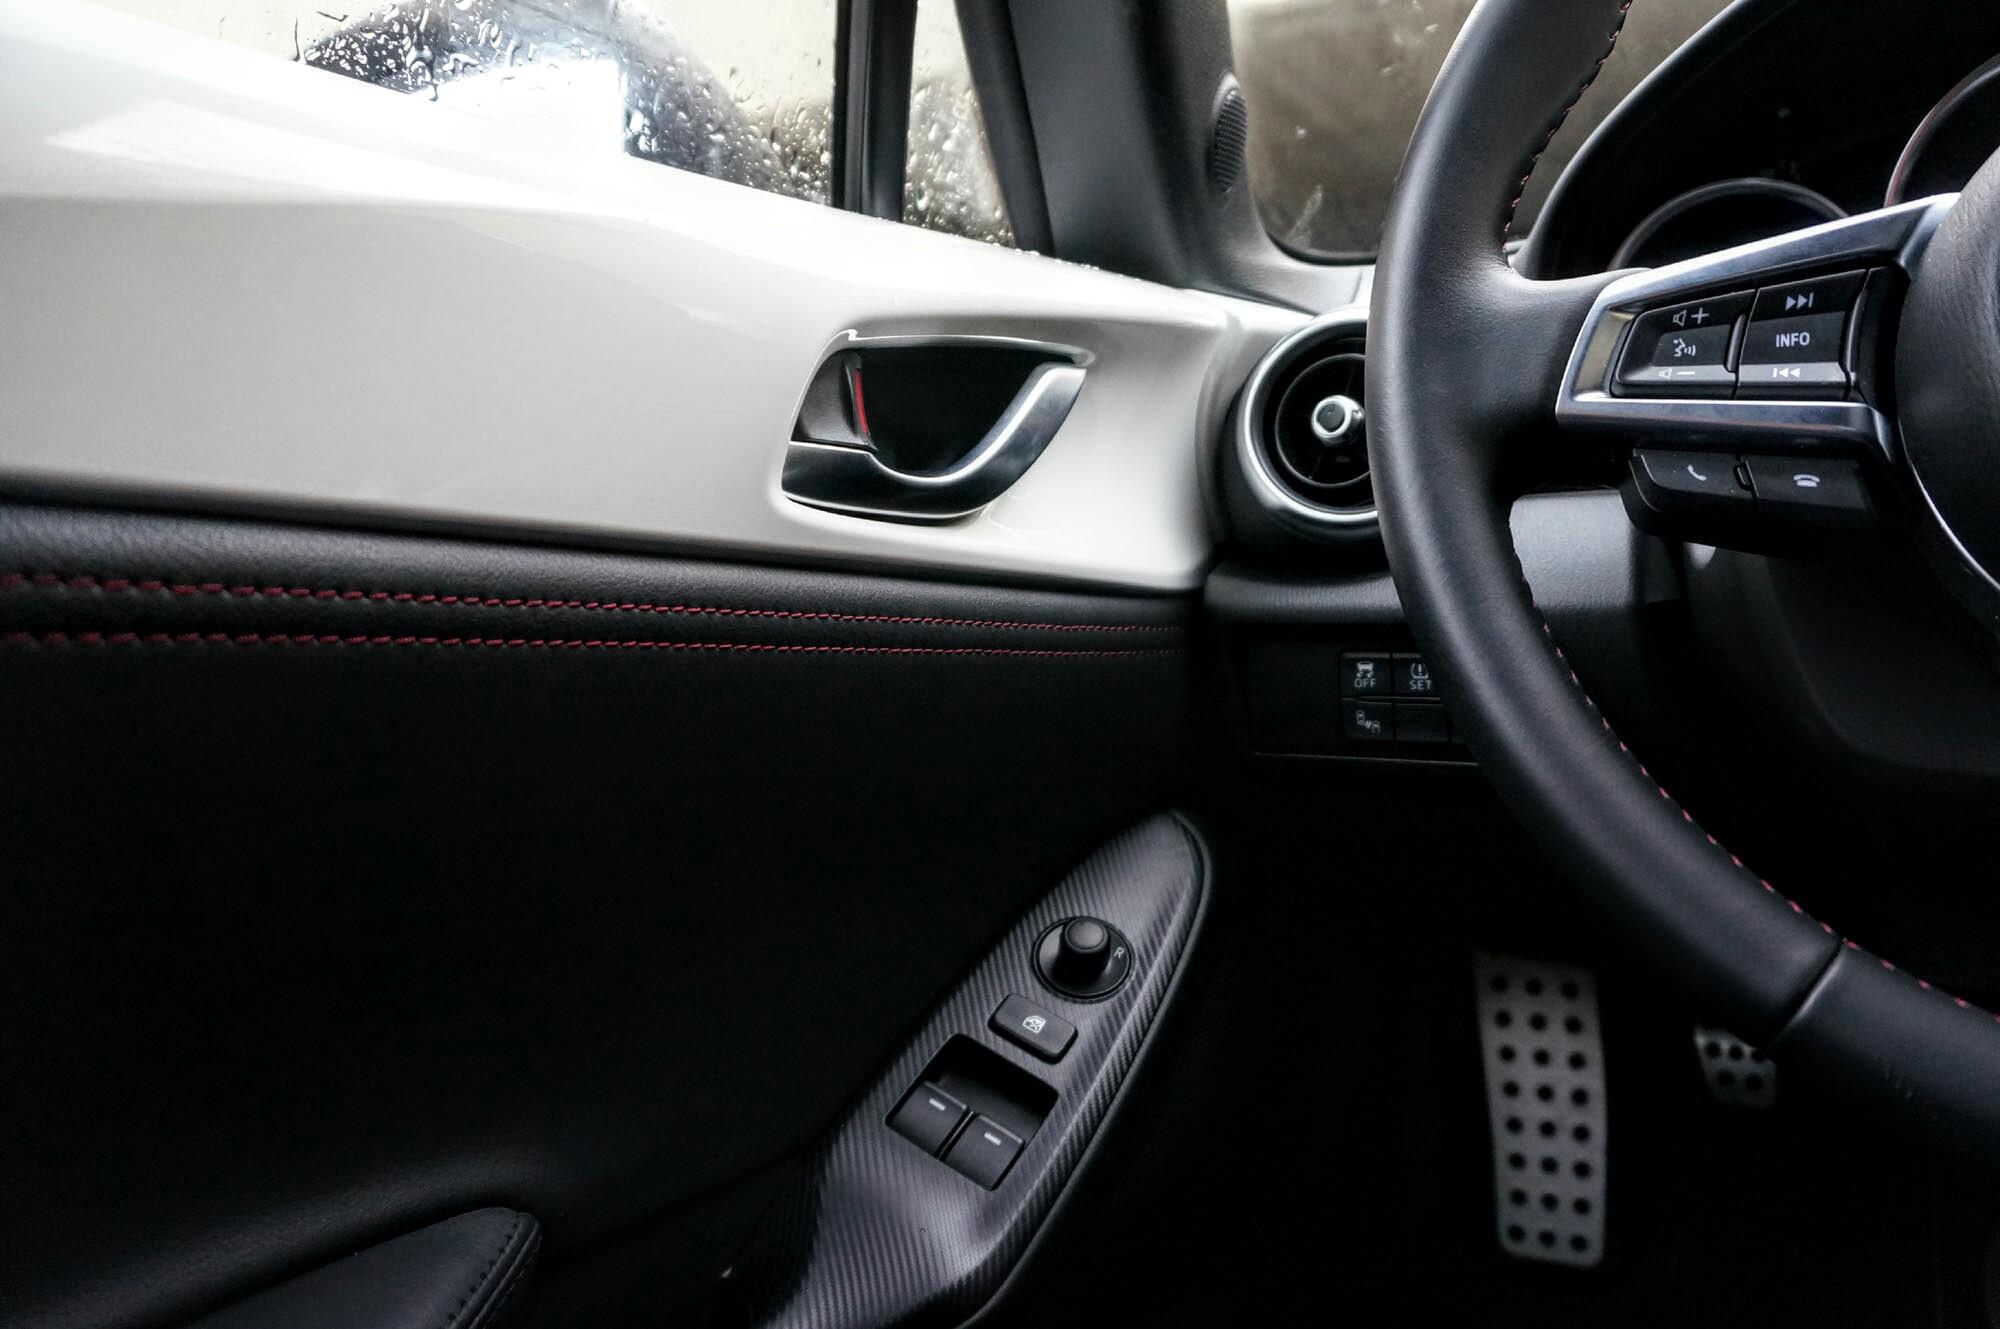 mazda mx5 2015 miata roadster essai 11 en voiture carine. Black Bedroom Furniture Sets. Home Design Ideas